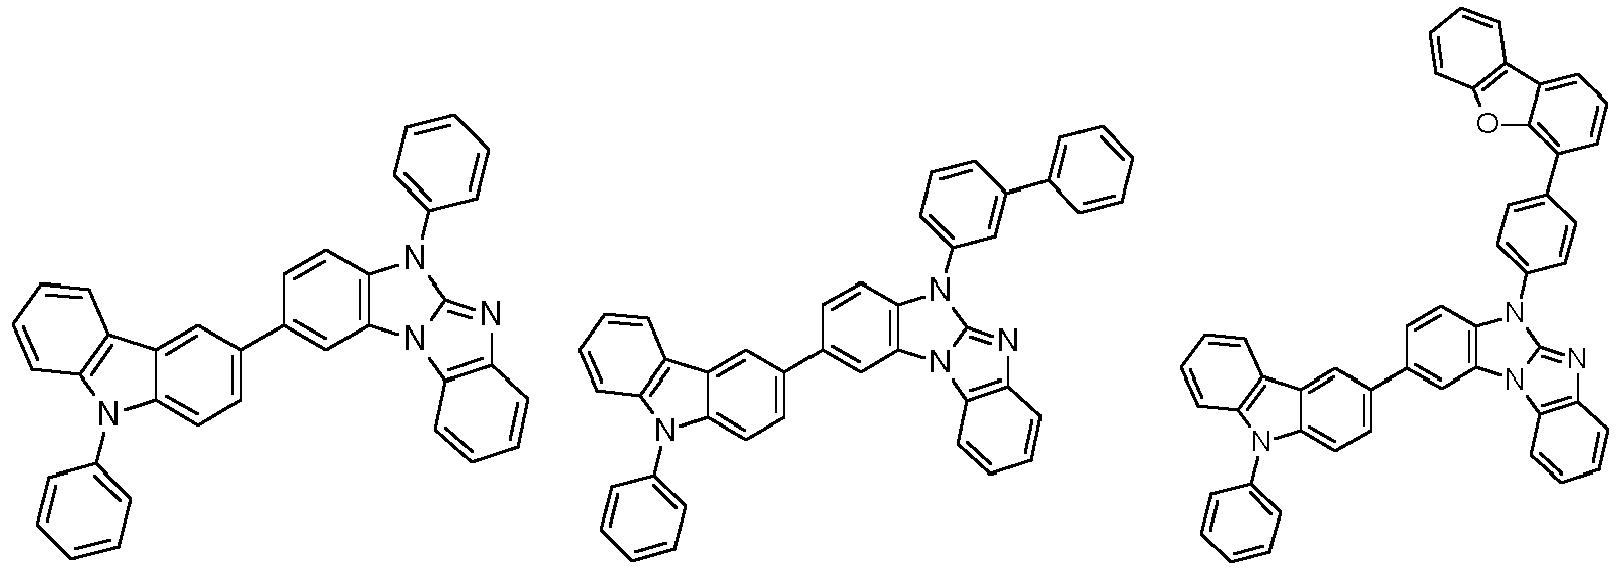 Figure imgb0837